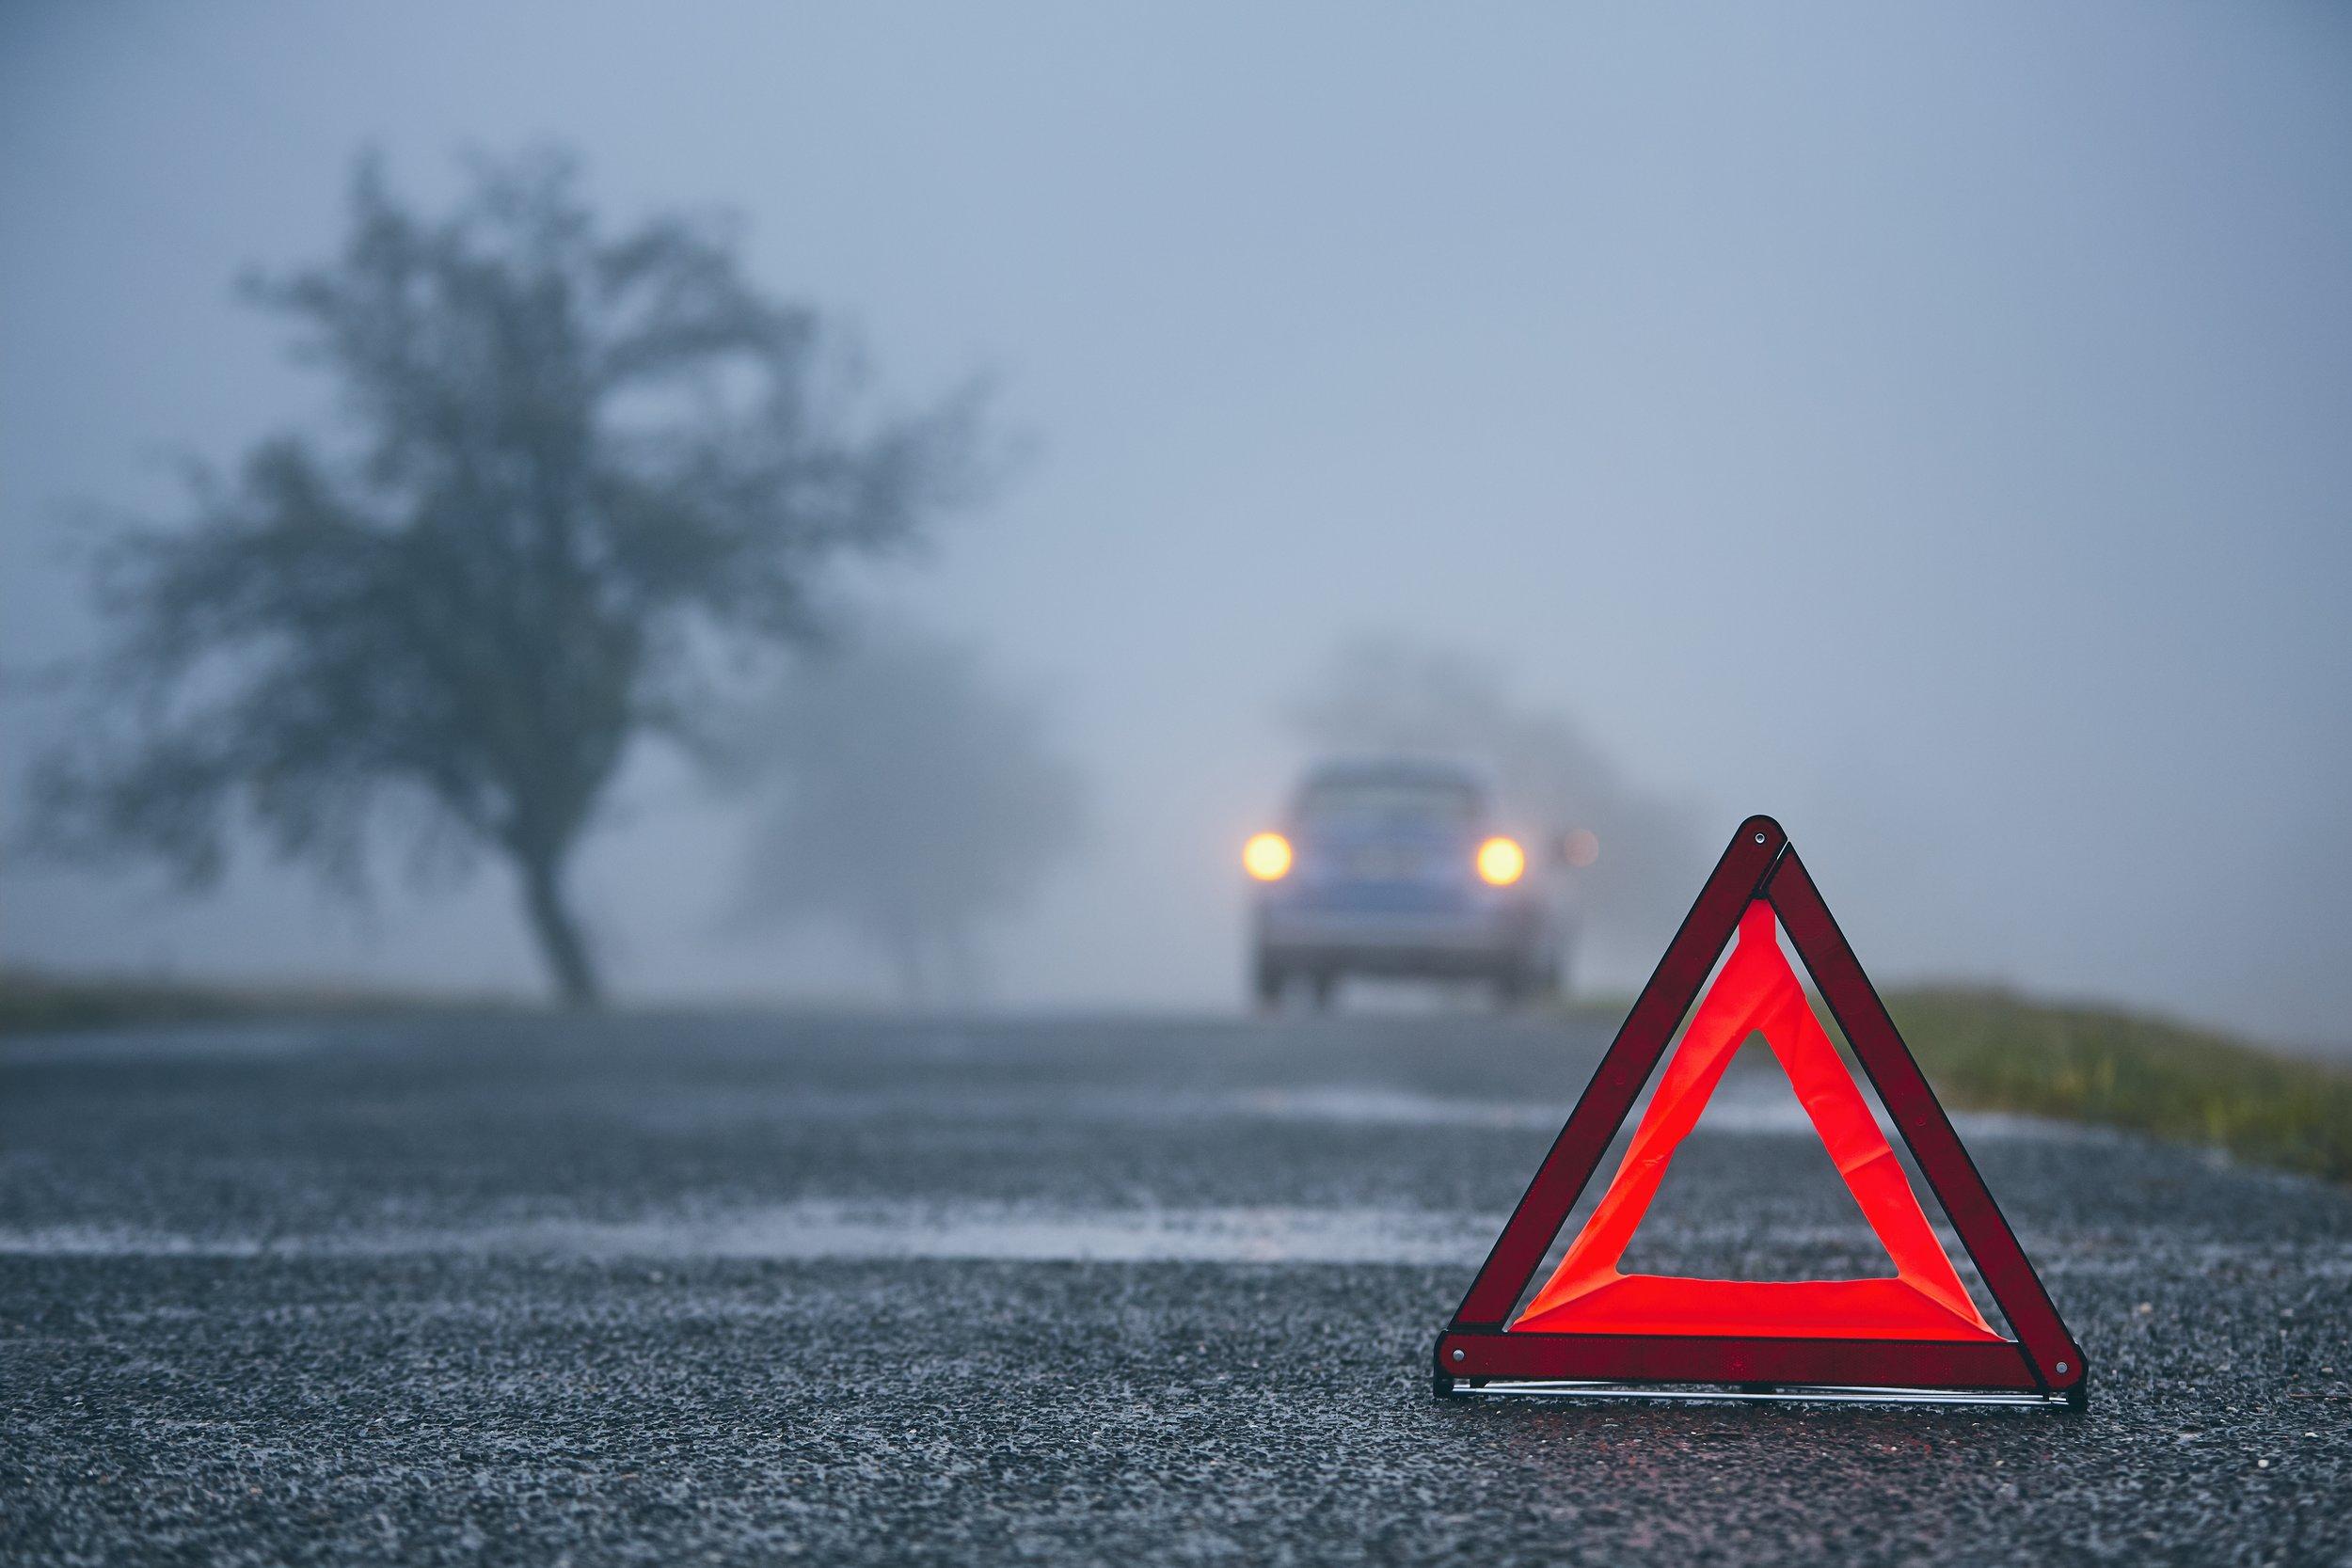 traffic-problem-in-thick-fog-23LF7TZ.jpg